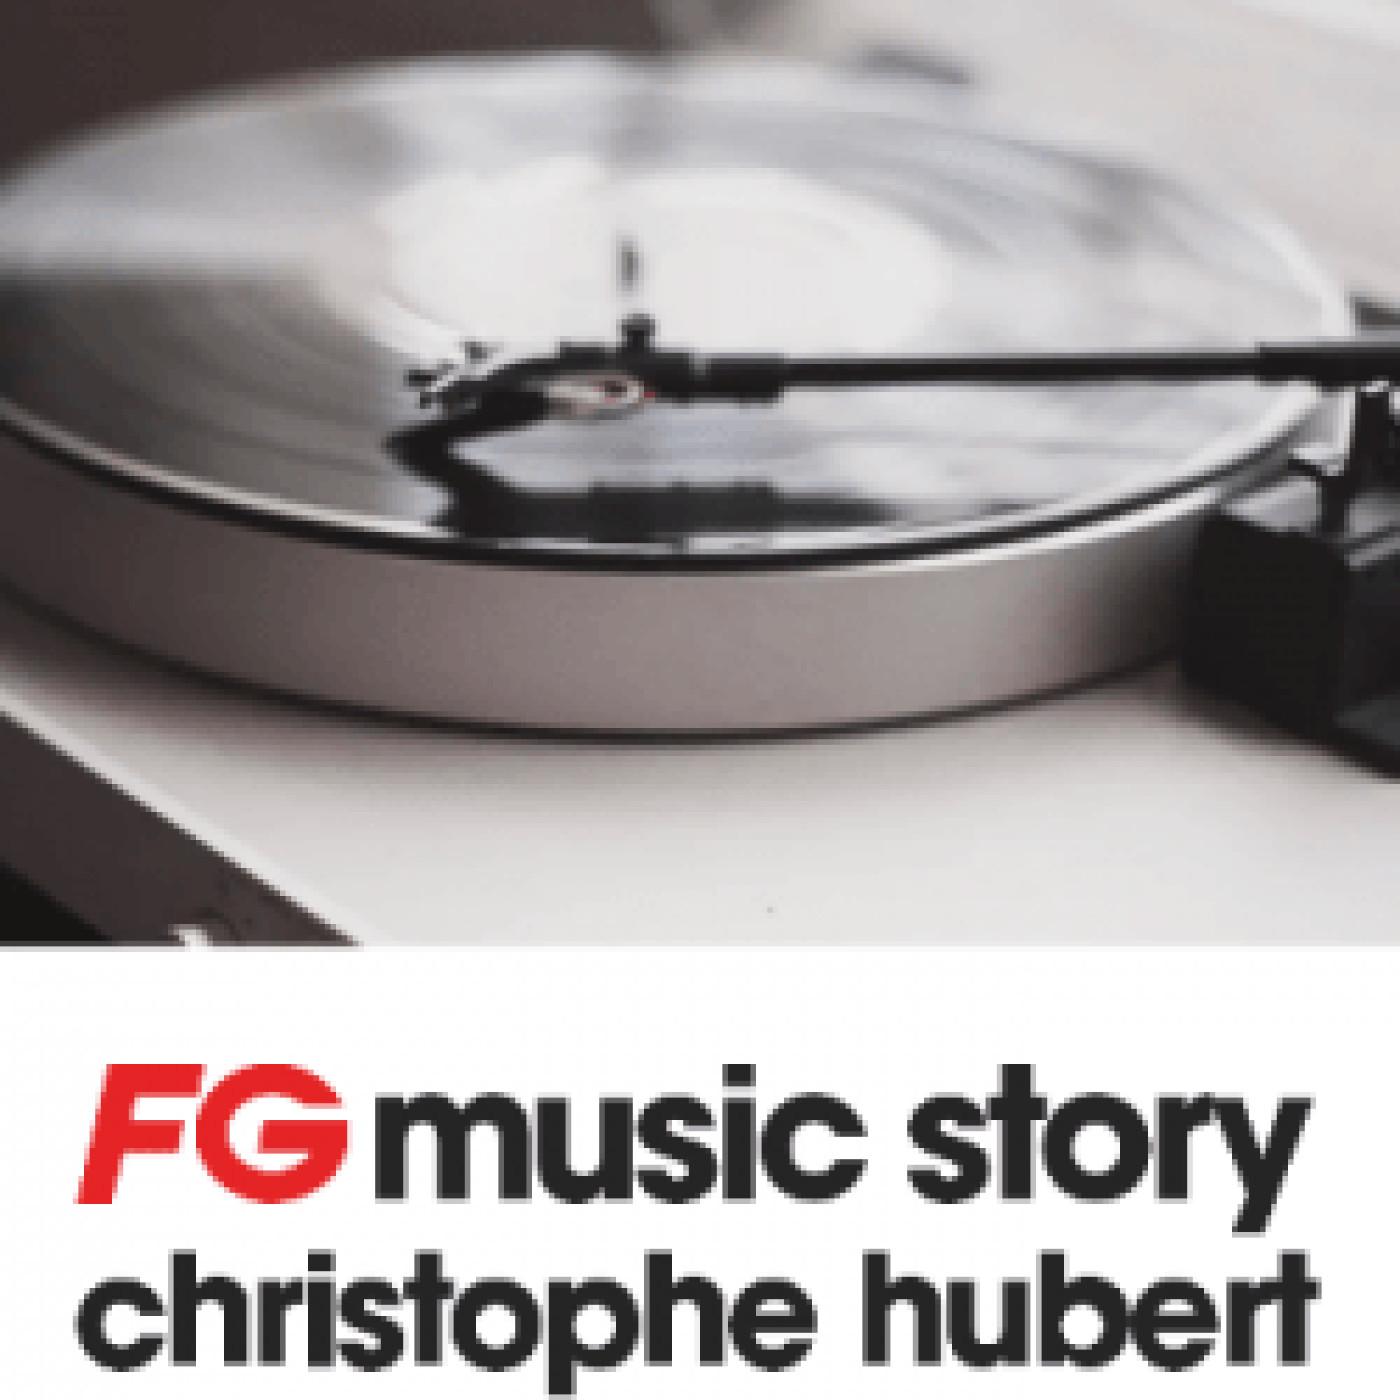 FG MUSIC STORY : MADEON